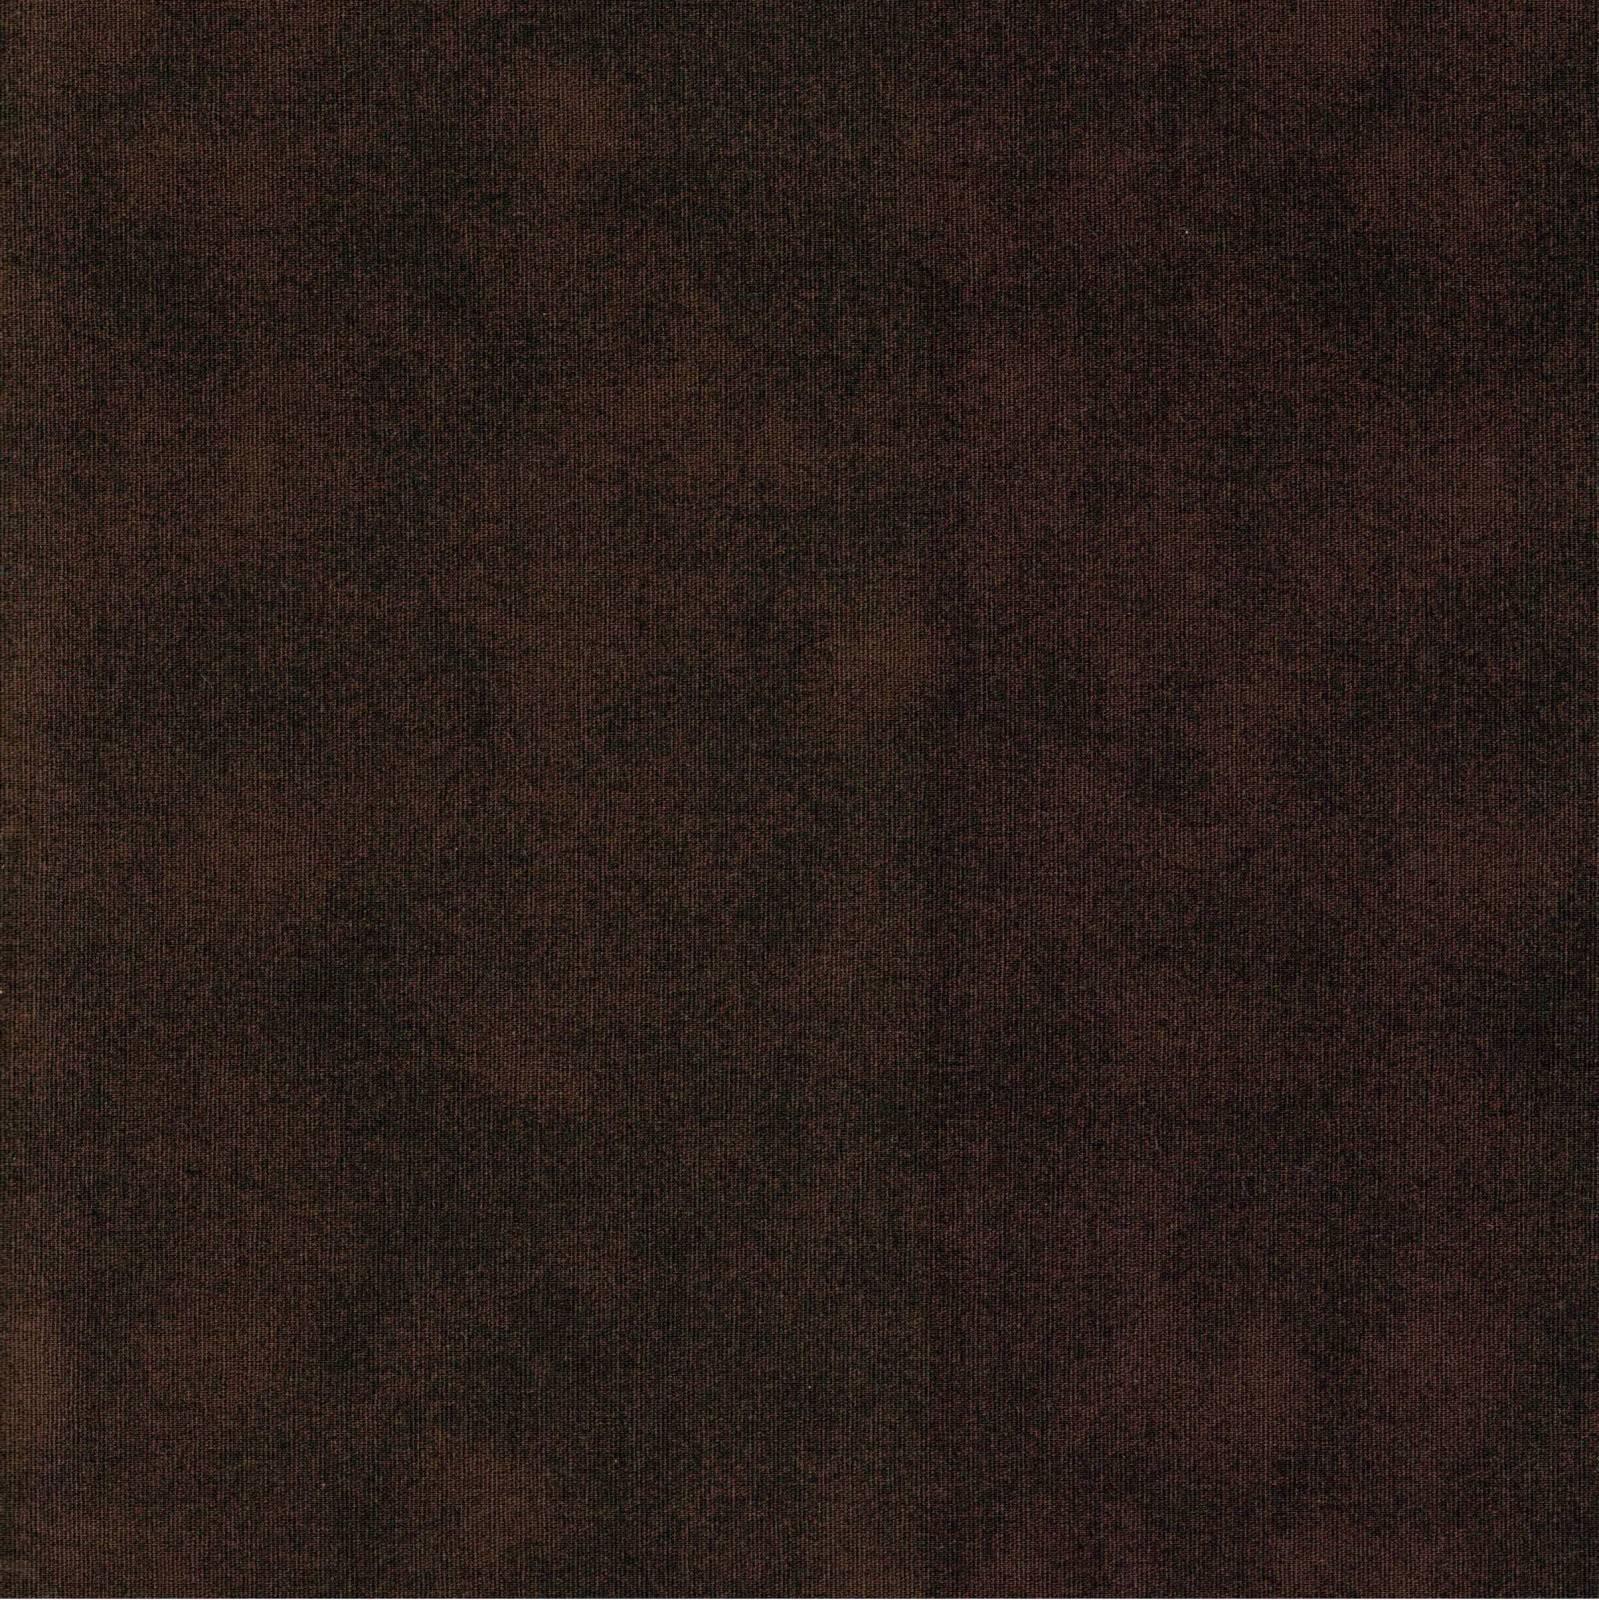 Poeira Marrom Terra Ref. 1131 Cor 102 Peripan - Armarinhos Nodari